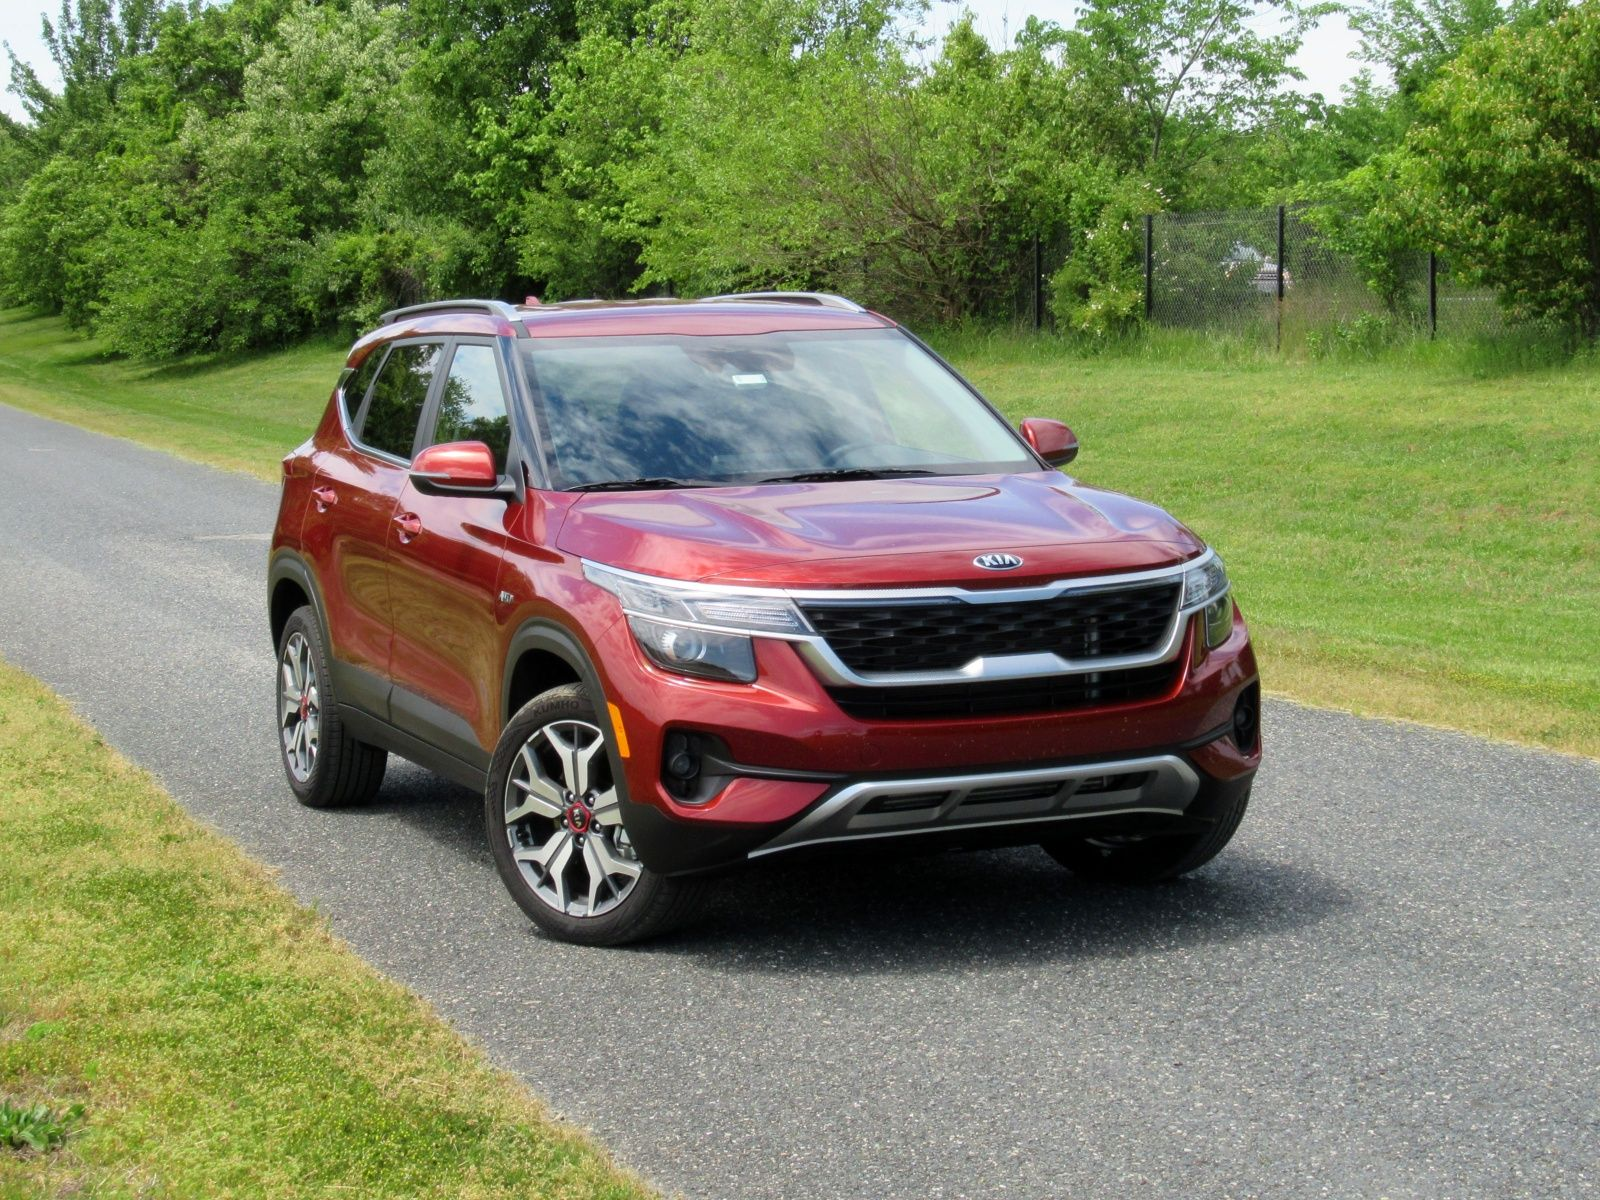 2021 Kia Seltos Driven Top Speed In 2020 Kia Latest Cars Chevrolet Trailblazer